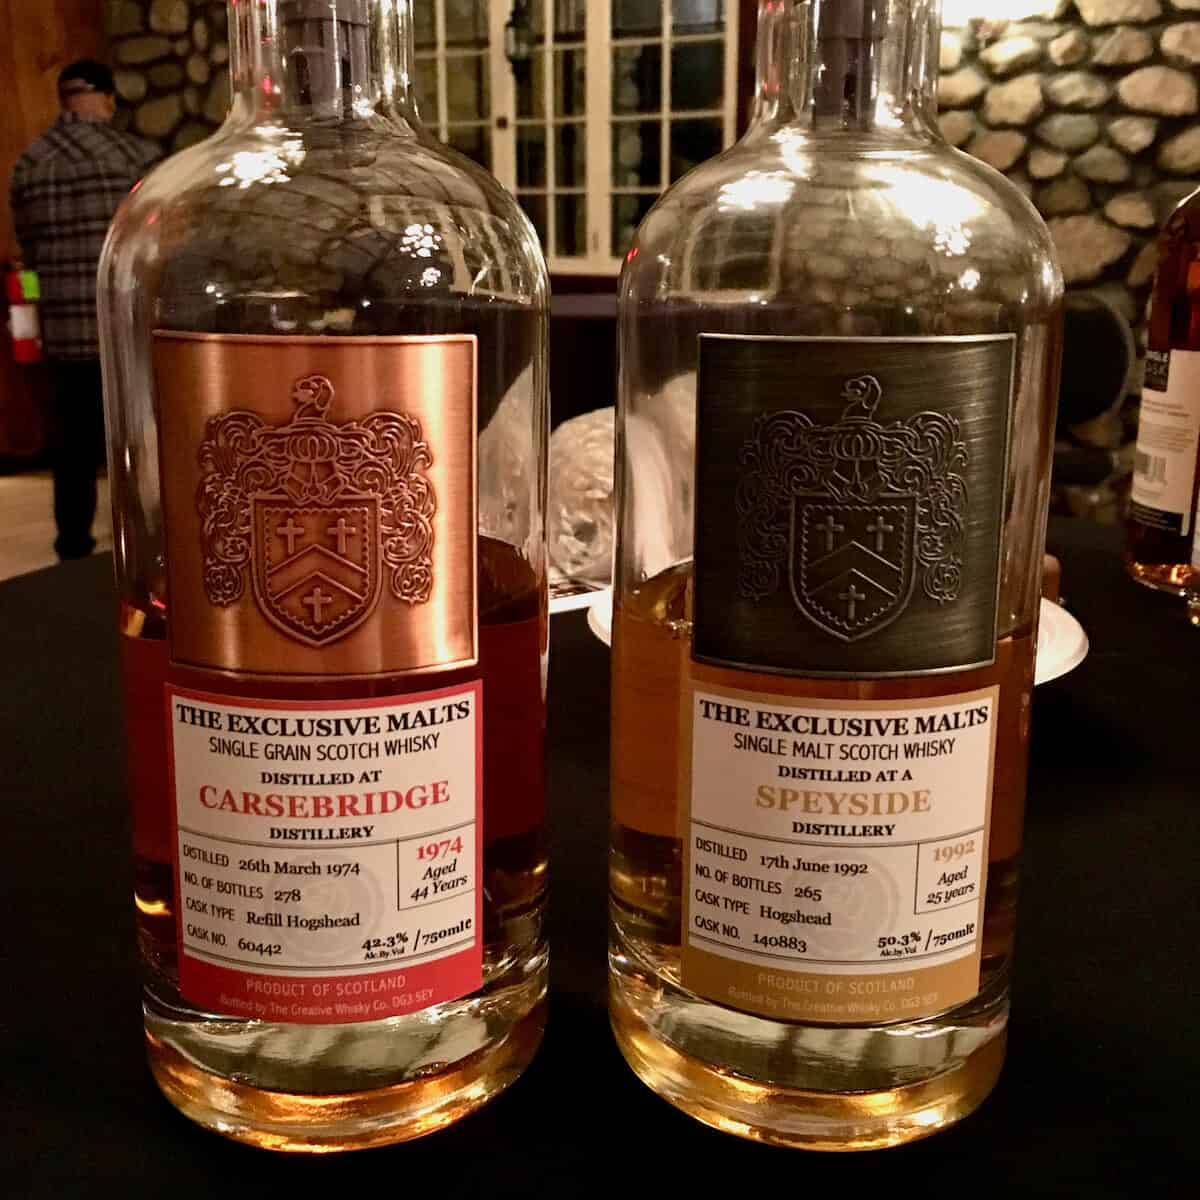 Exclusive Malts Carnebridge & Speyside bottles on a table.